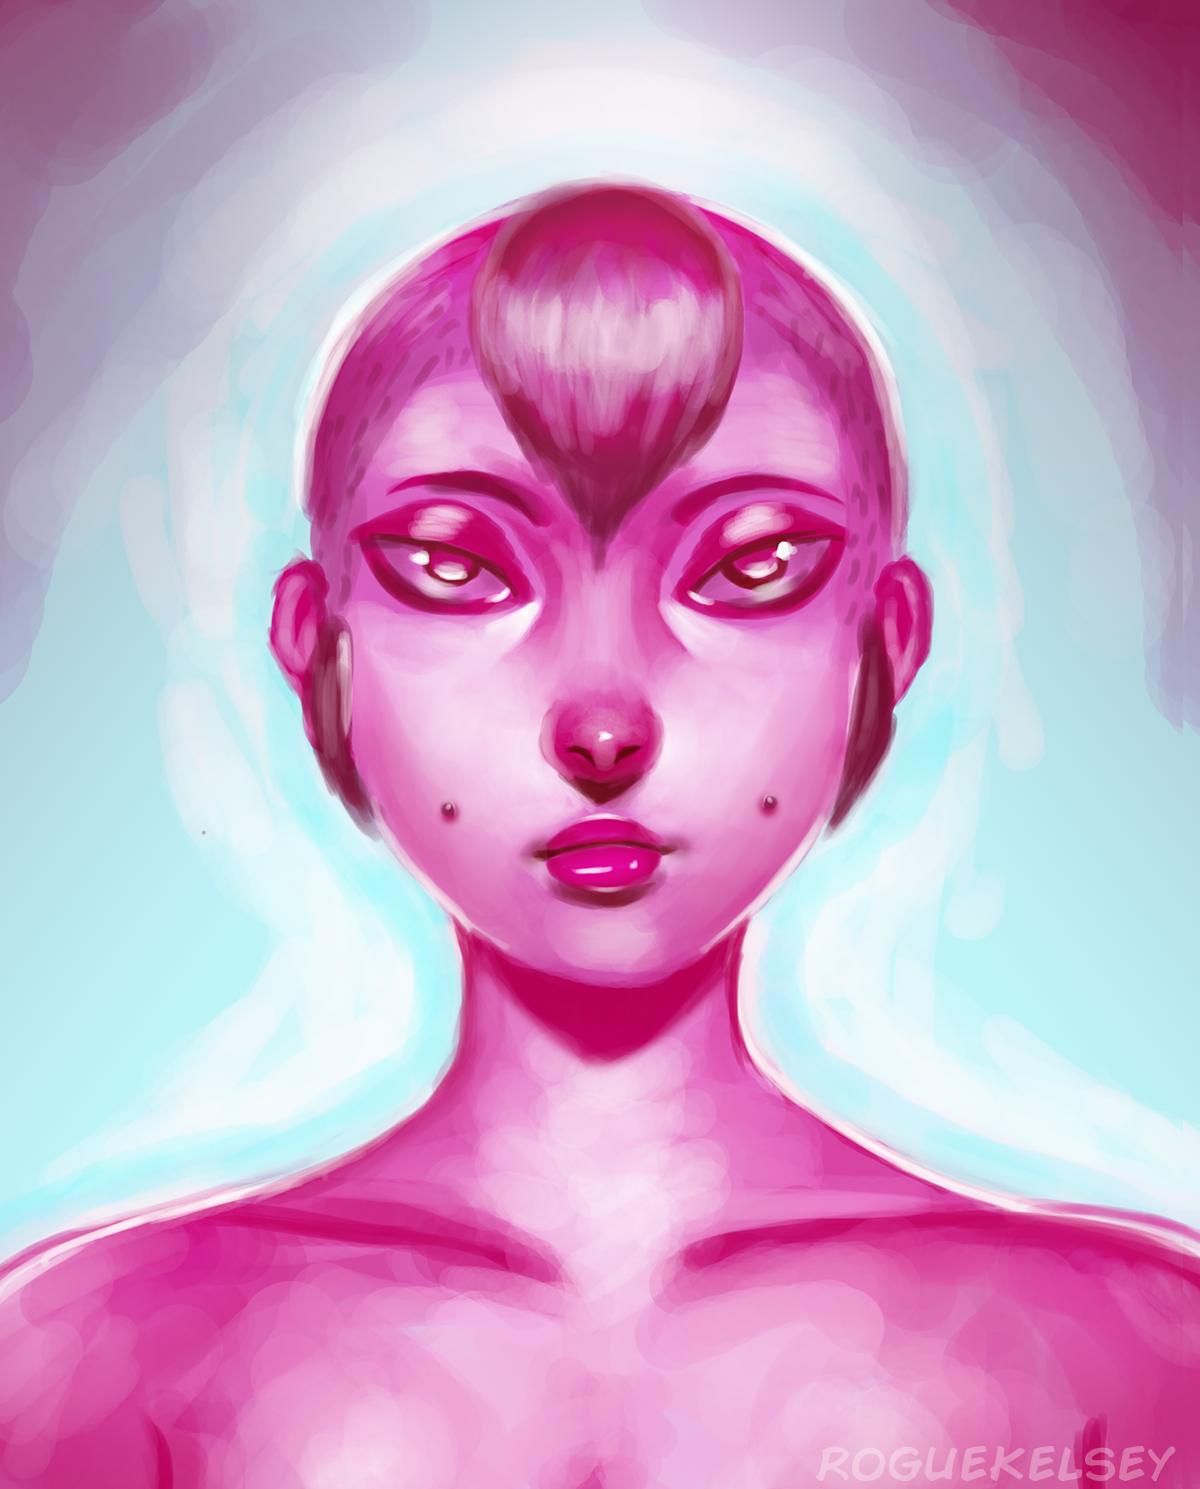 Another Pink Portrait (Speedpaint) by ROGUEKELSEY